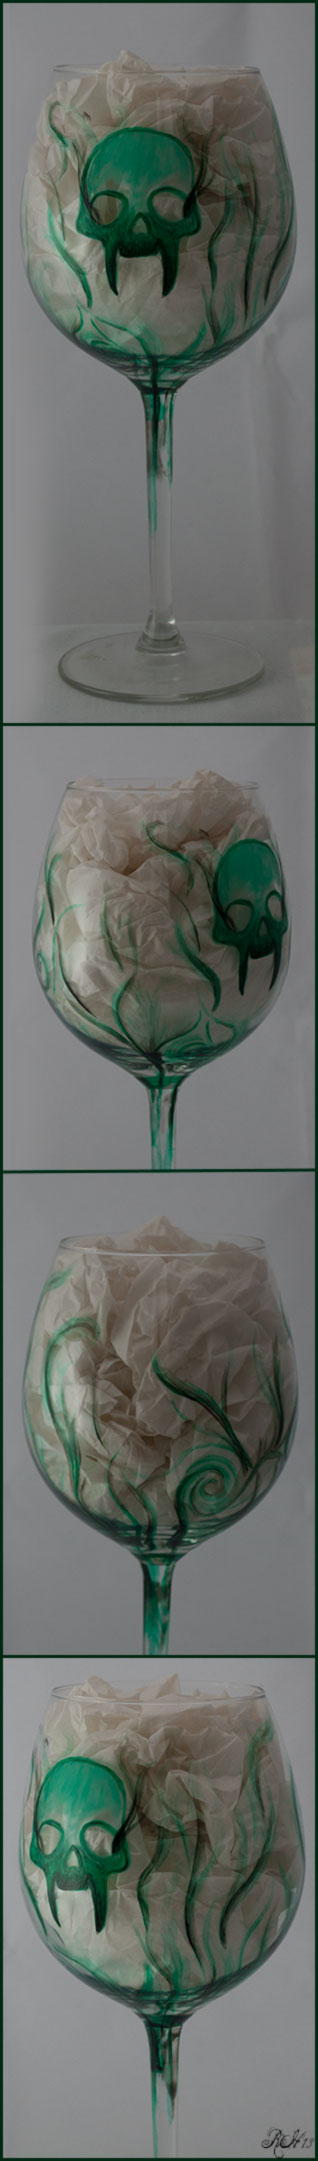 Deadly glass by KittenCeleste